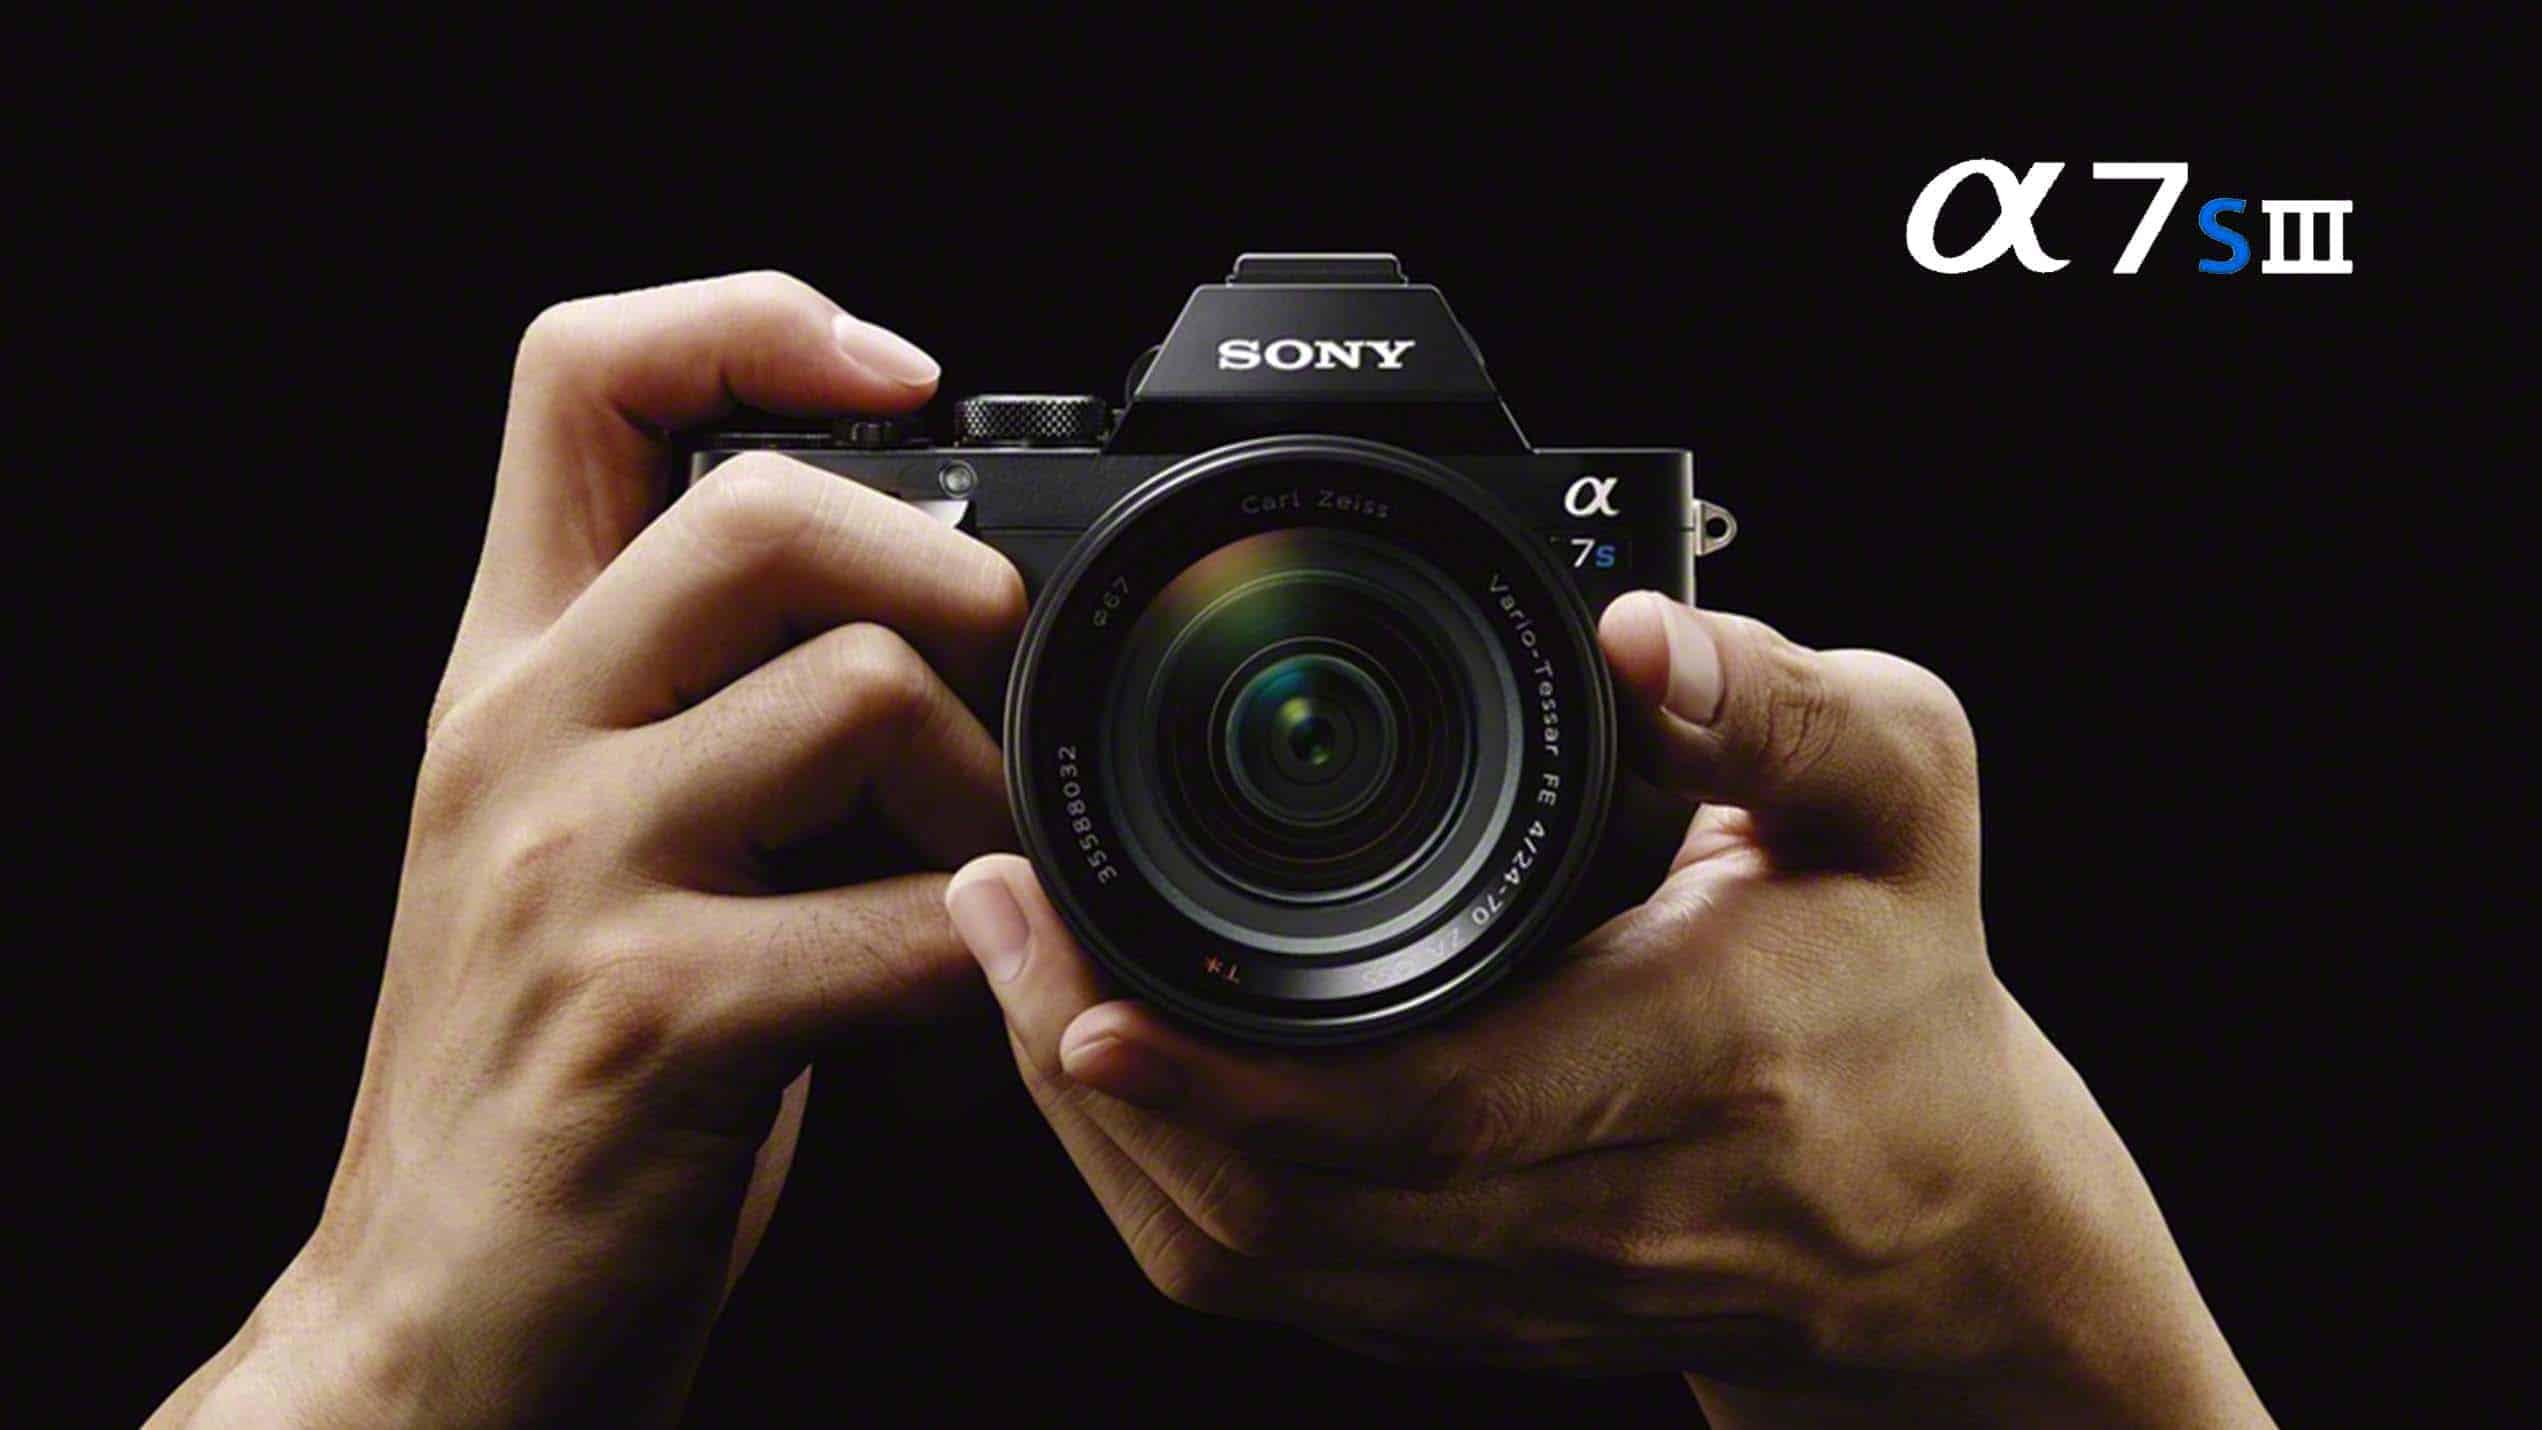 Sony finalmente anuncia la tan esperada Alpha a7S III.